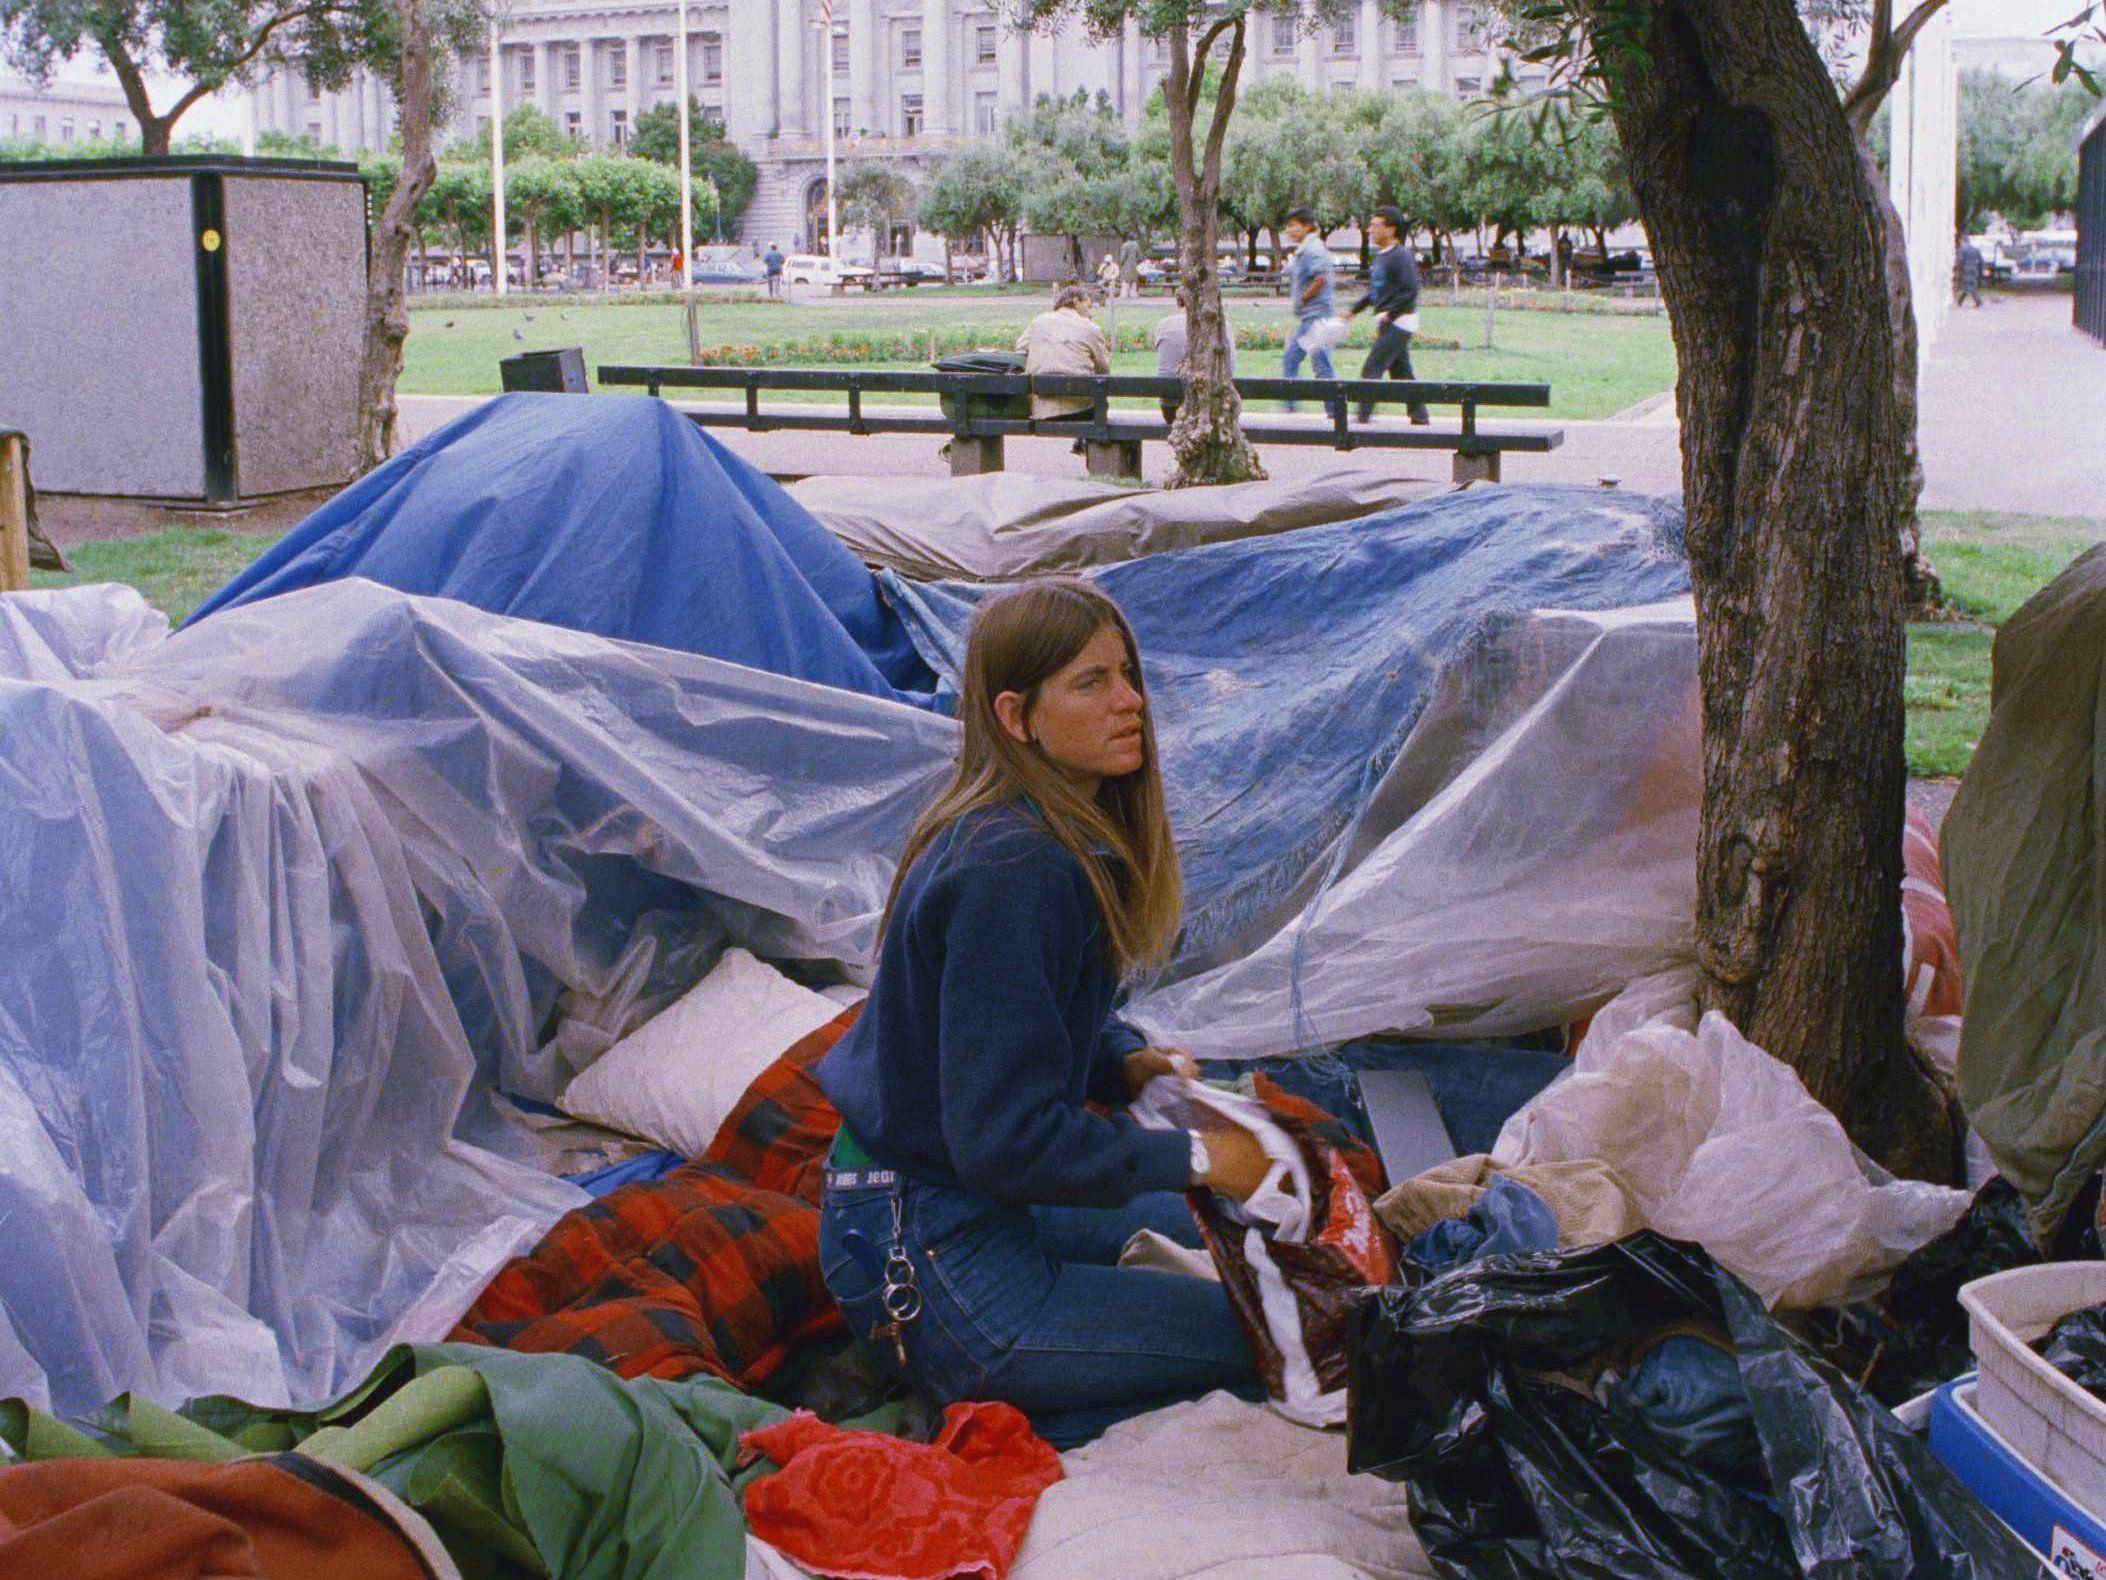 San Francisco Mayor Proposes Sheltering Homeless On A Navy Ship Navy Ships San Francisco